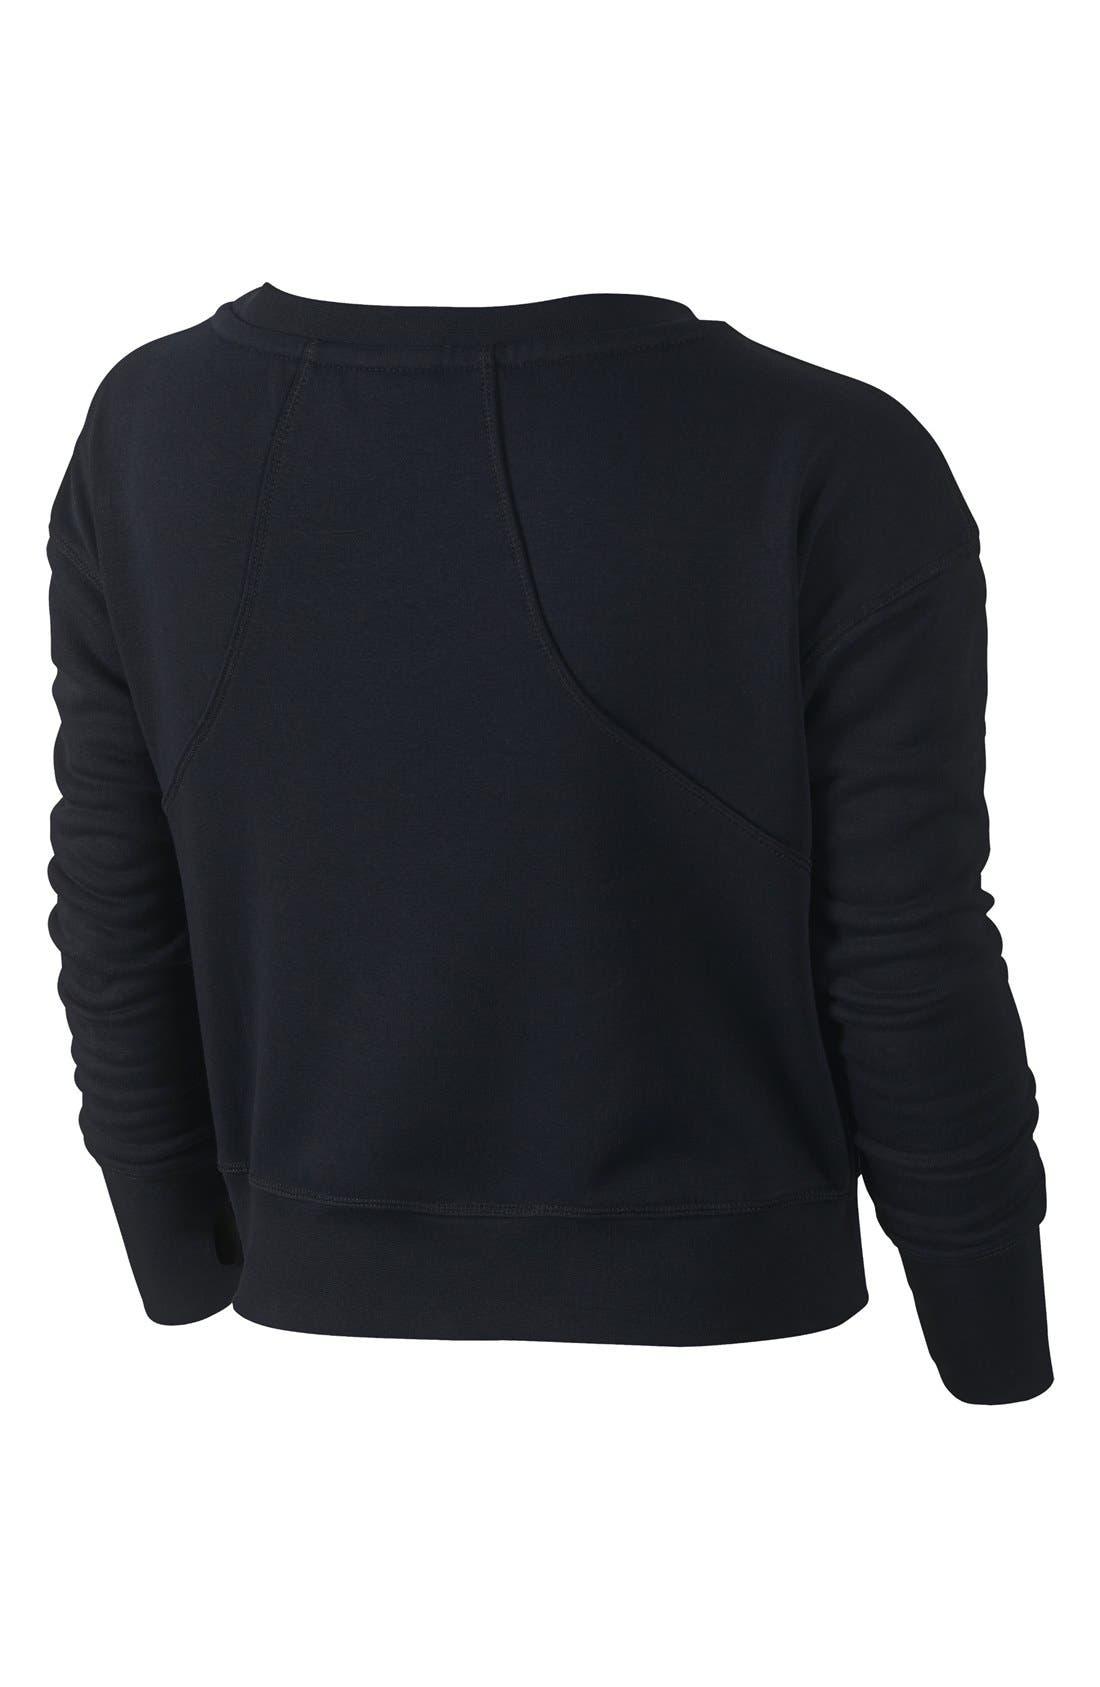 Alternate Image 2  - Nike Crop Sweatshirt (Big Girls) (Online Only)